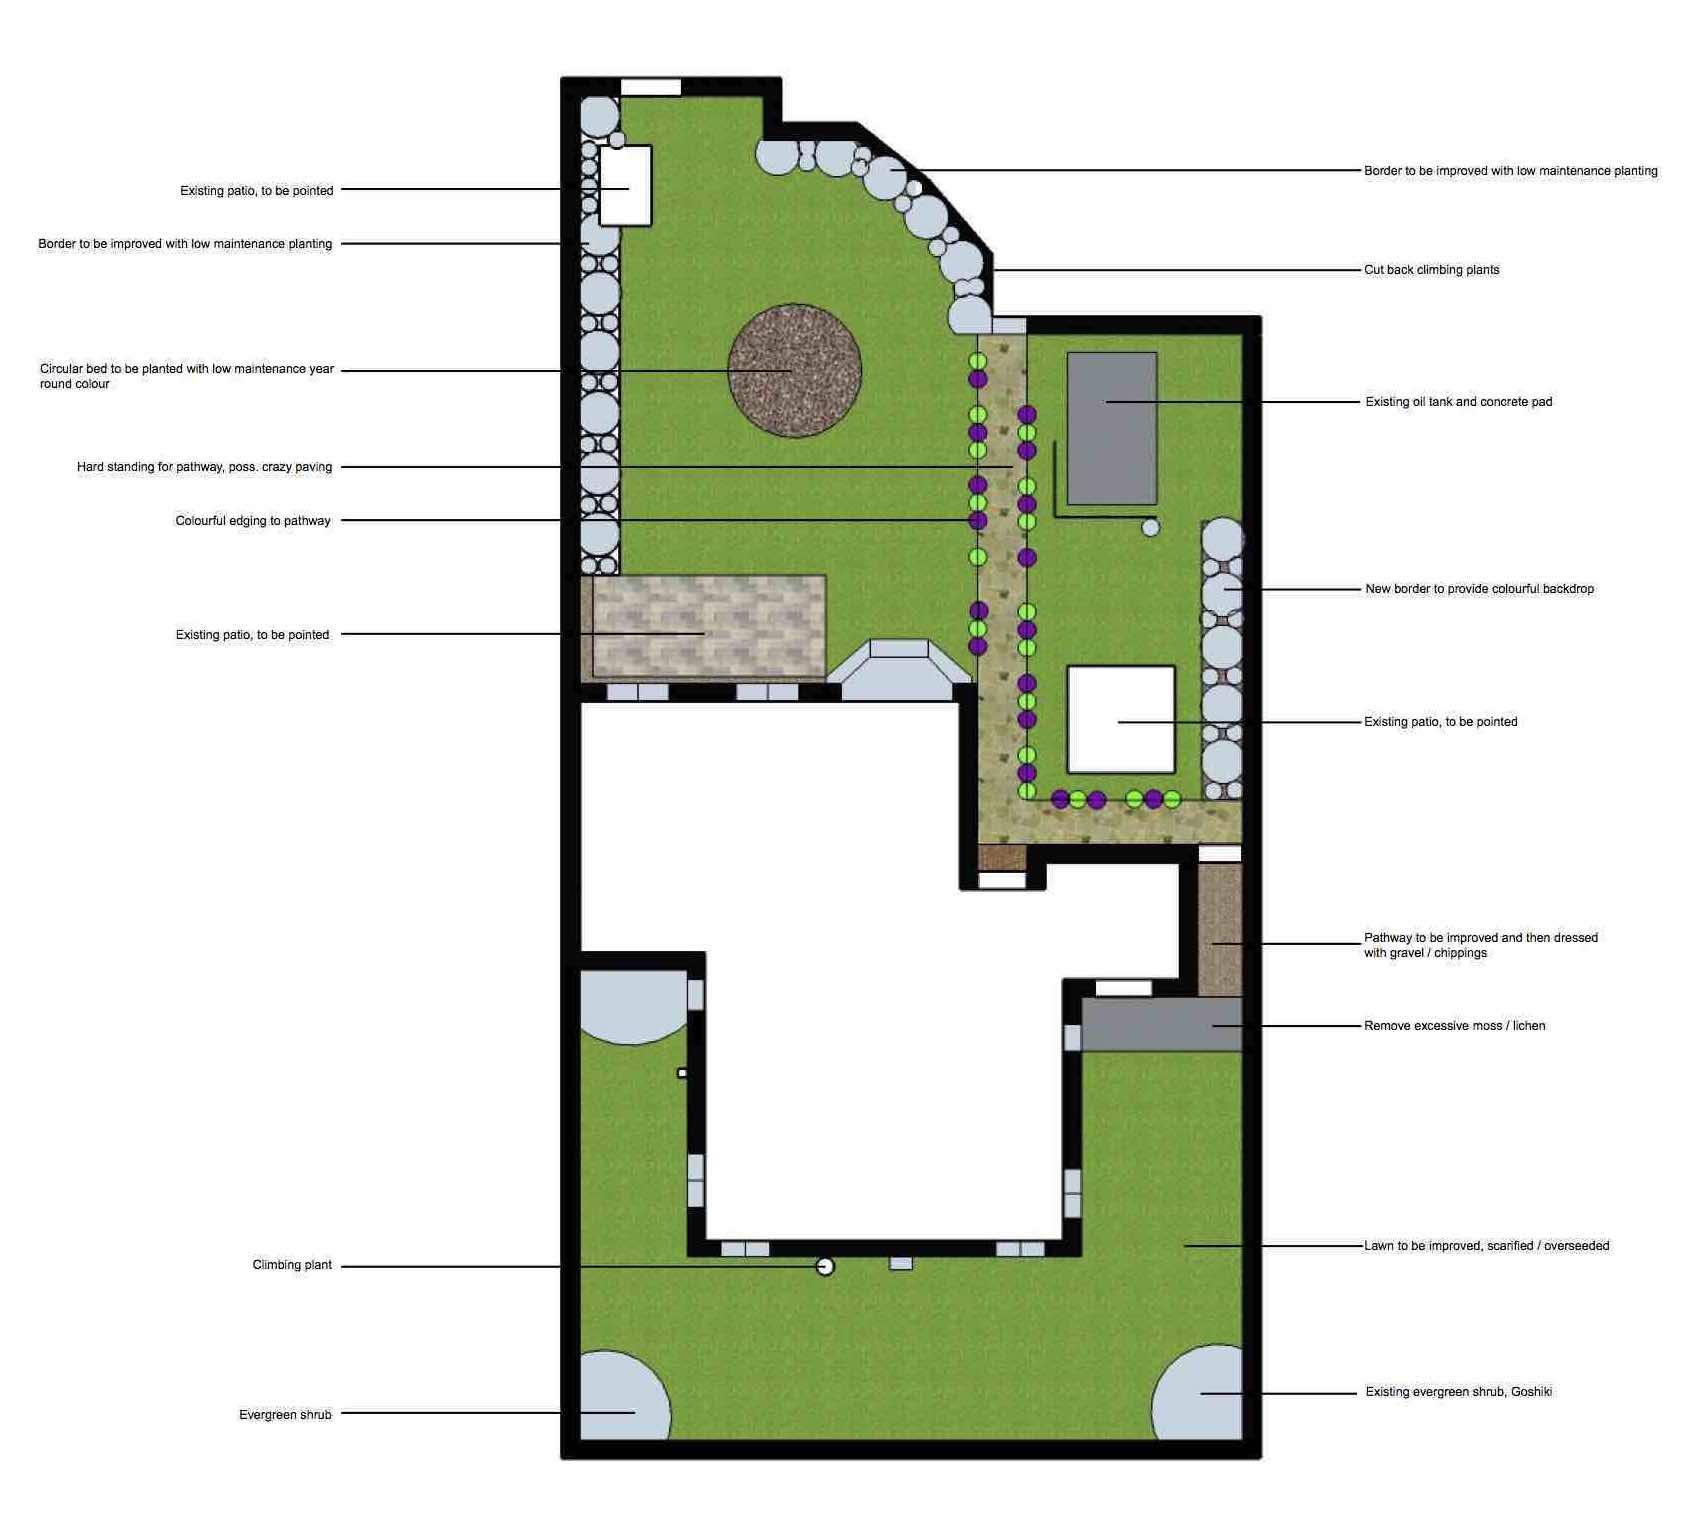 Initial Garden Design Proposal Hornby Garden Designs Garden